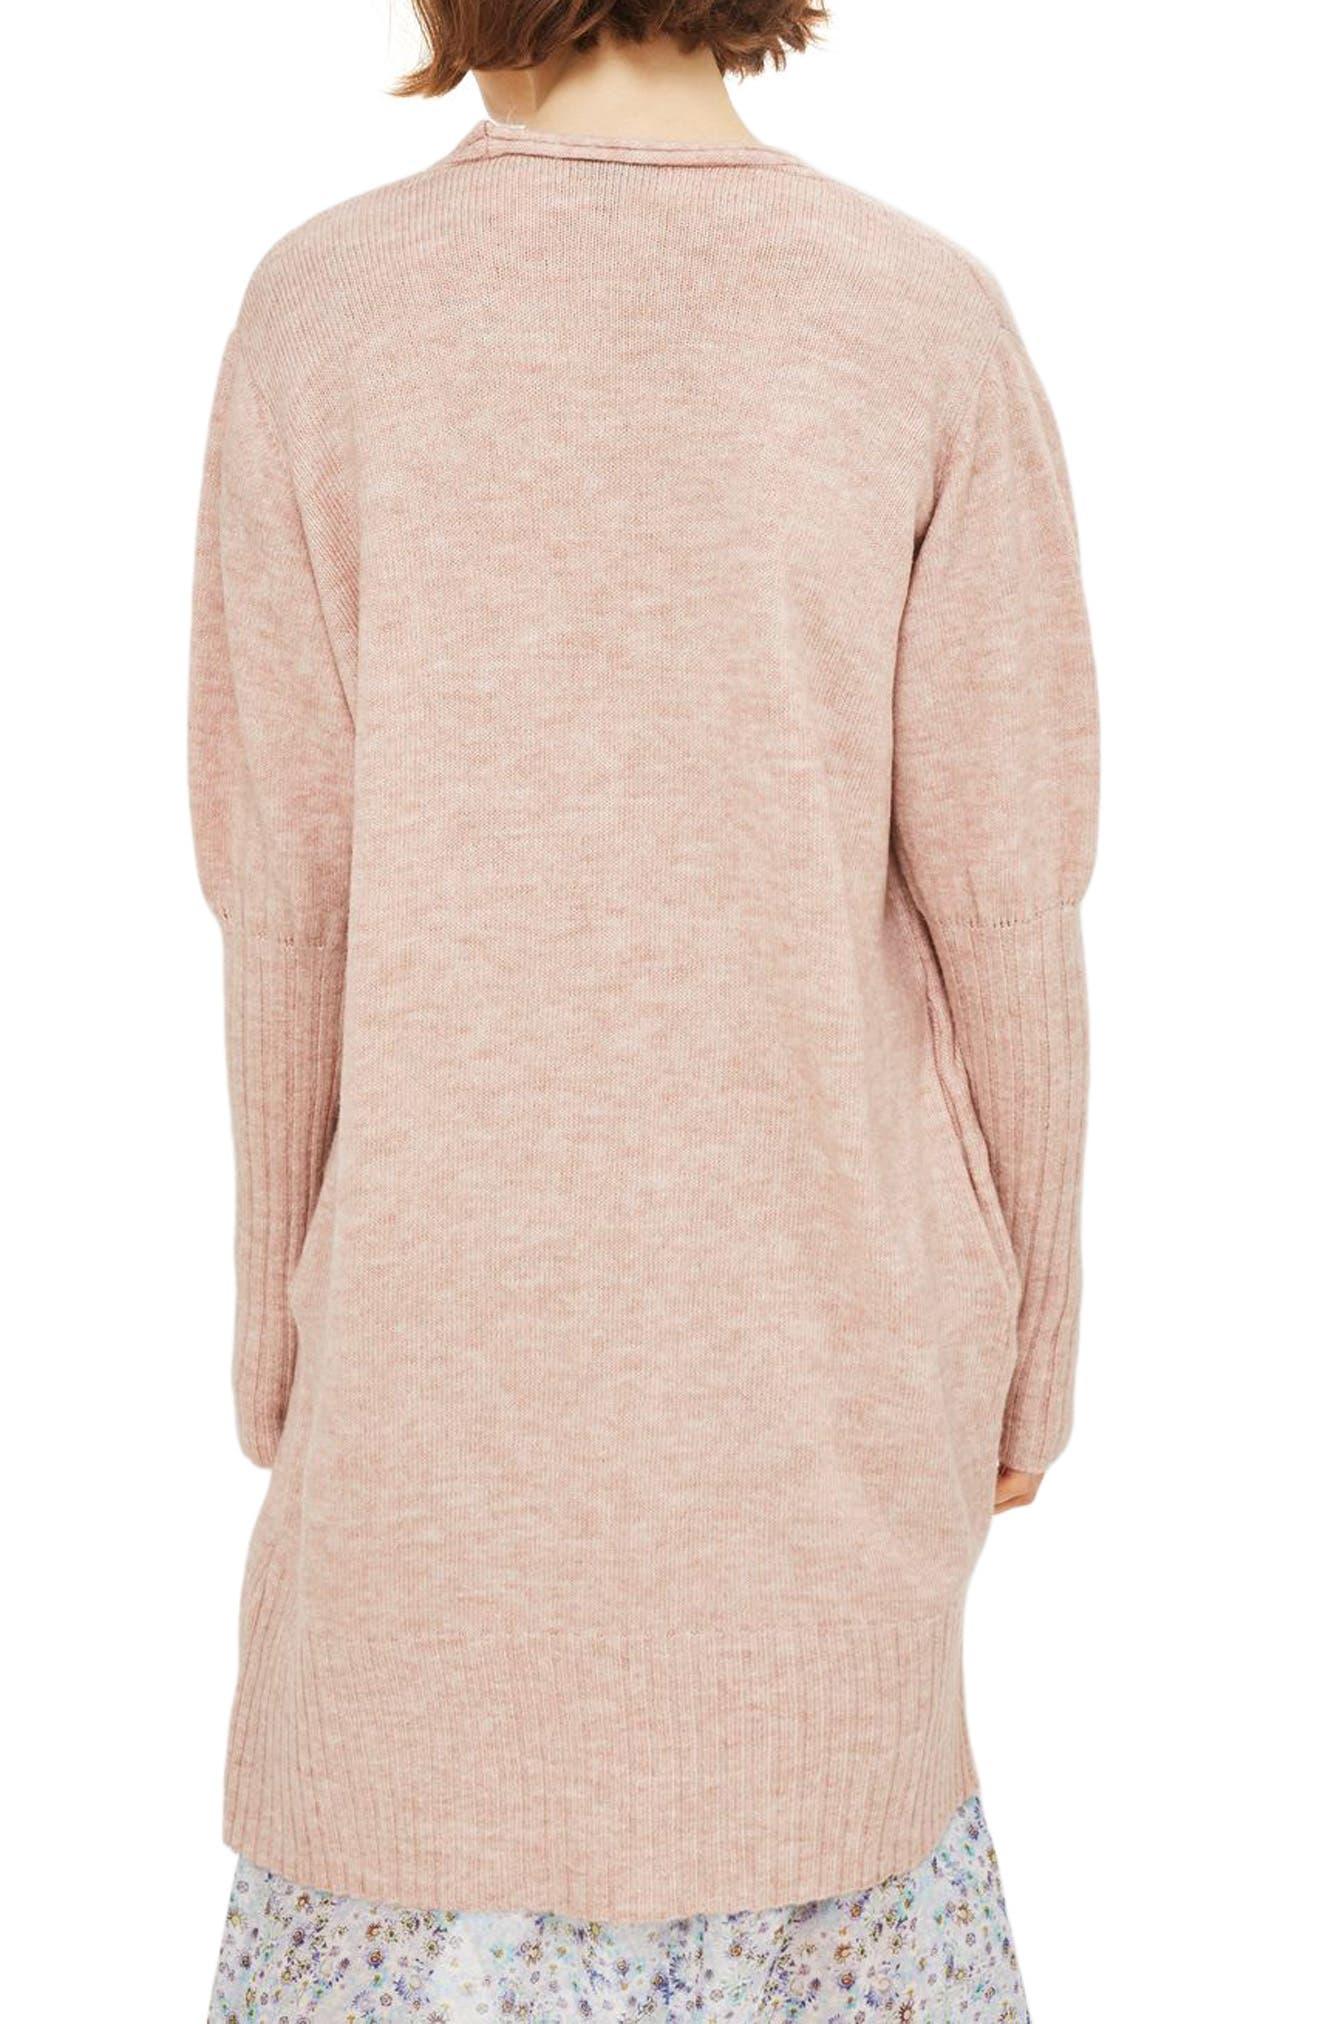 Women's Pink Sweaters | Nordstrom